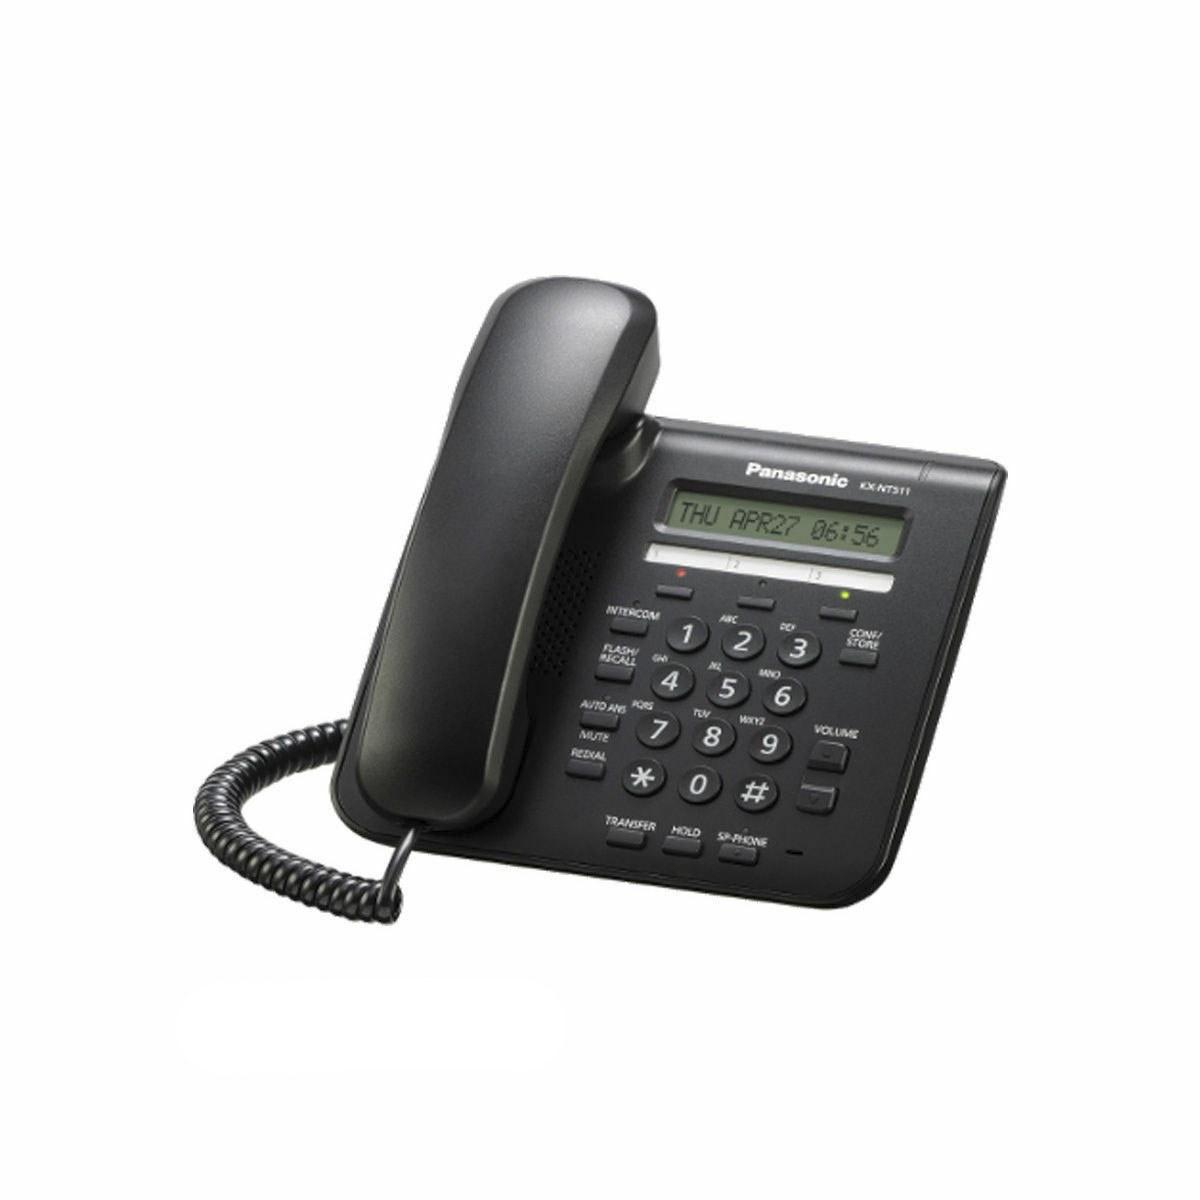 تصویر تلفن سانترال پاناسونیک مدل KX-NT511 A Panasonic KX-NT511 A Central Telephone